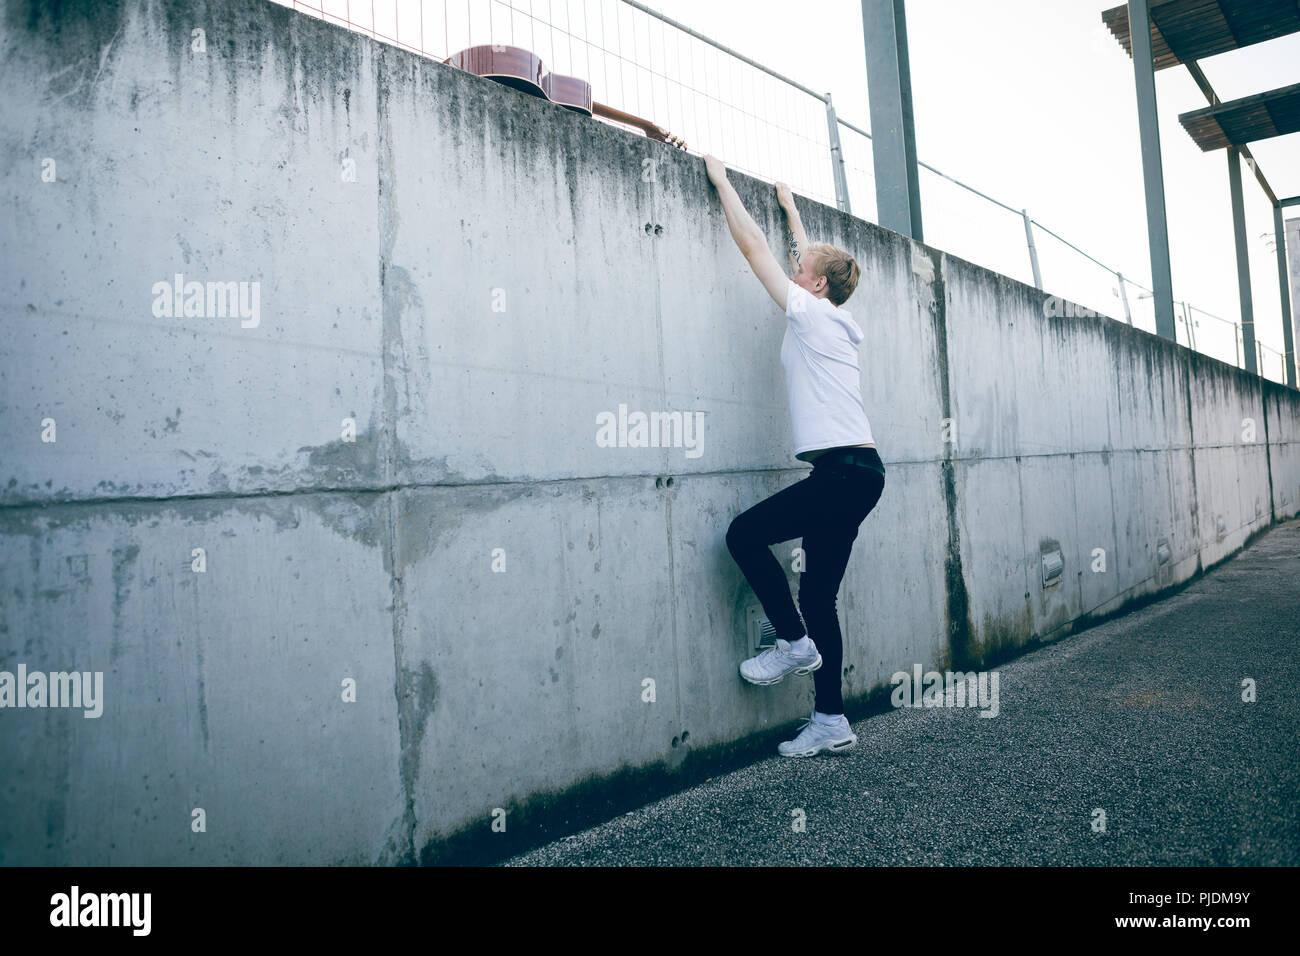 Young musician climbing wall - Stock Image